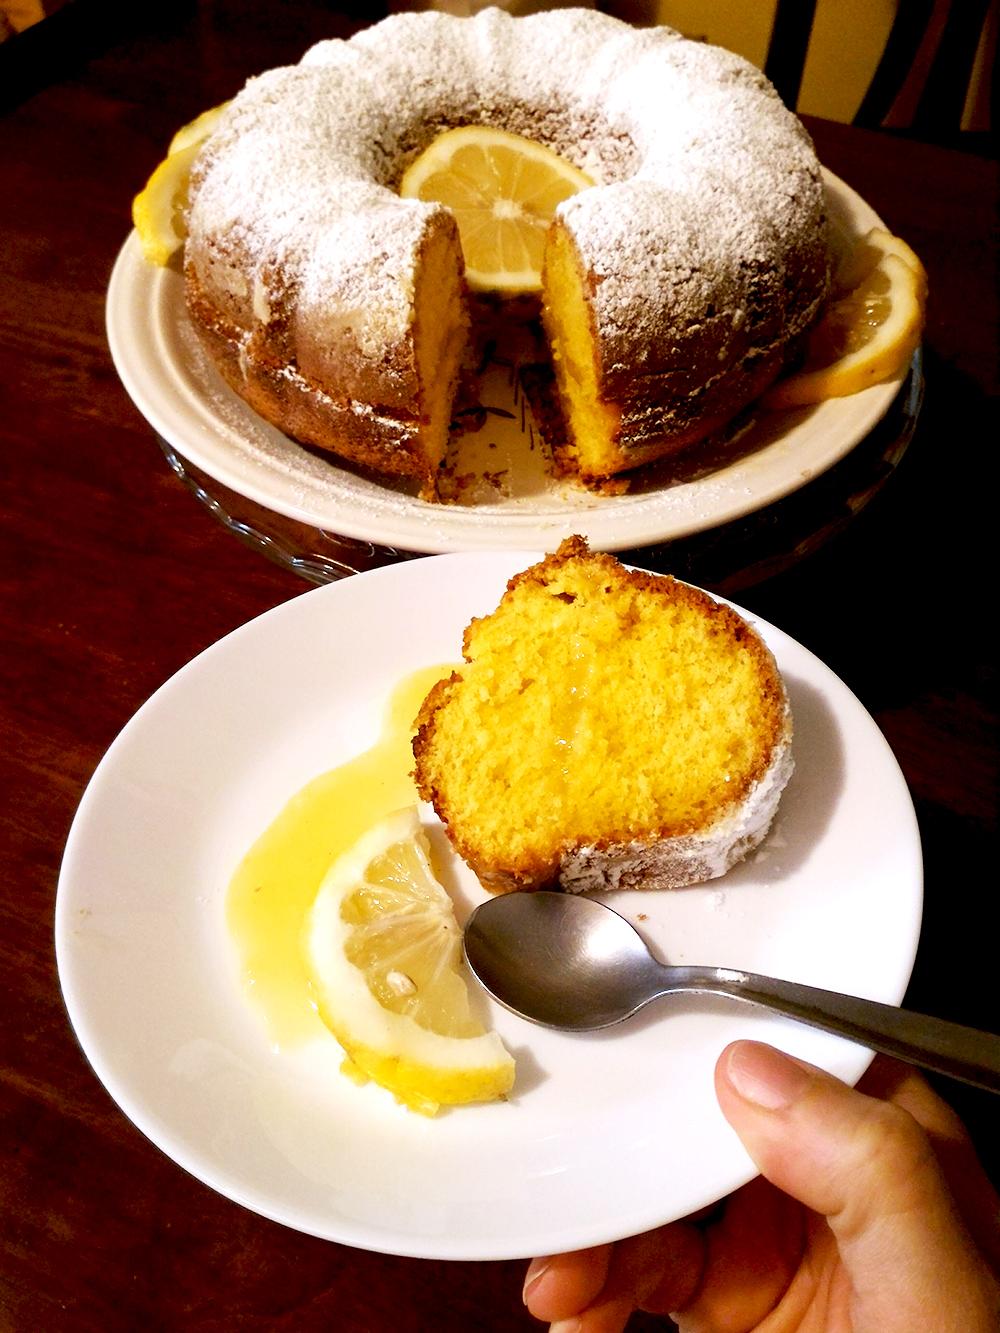 Torta_soffice_limone_1_gusciduovo.jpg